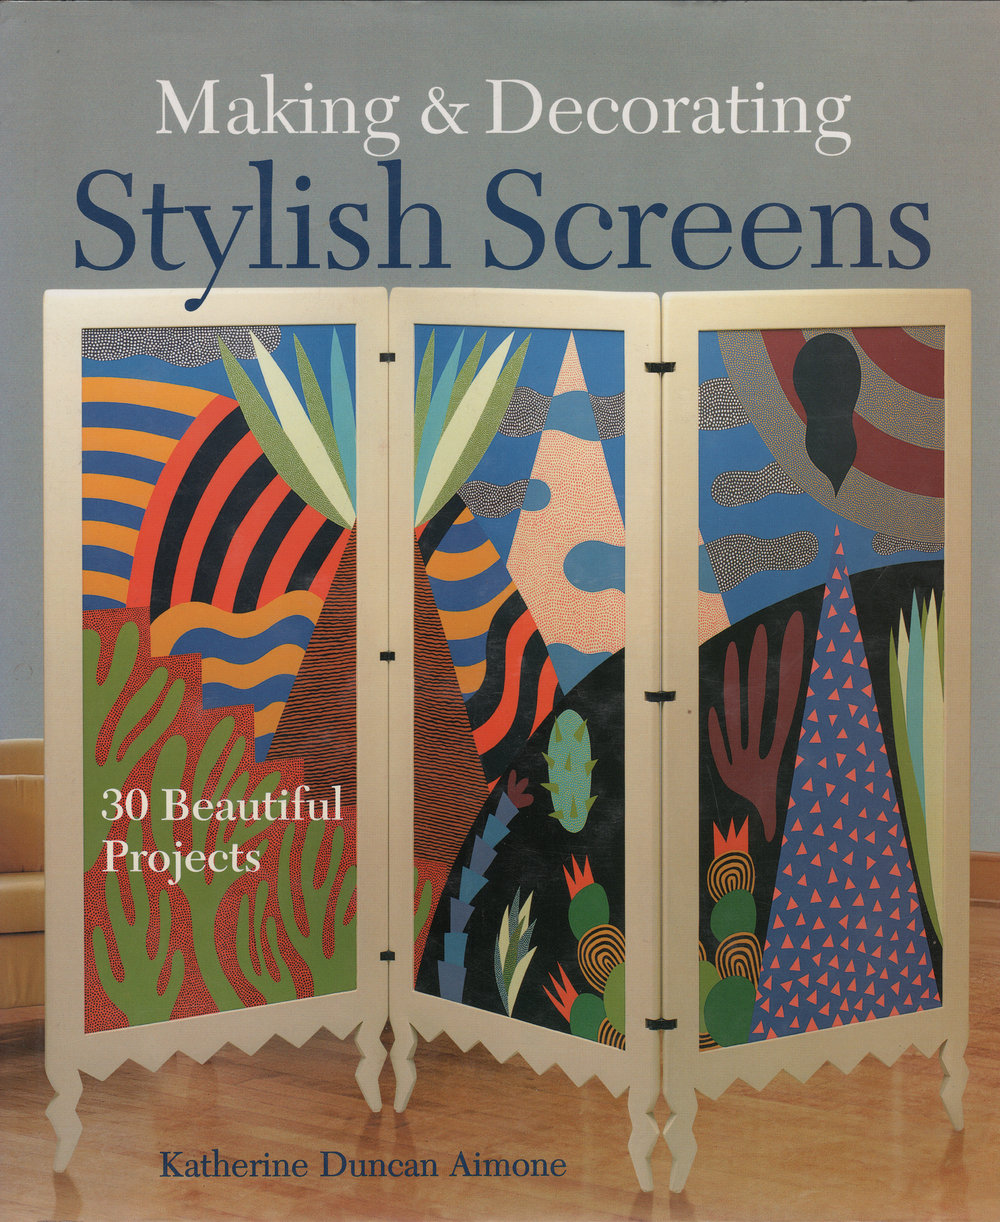 Making & Decorating Stylish Screens